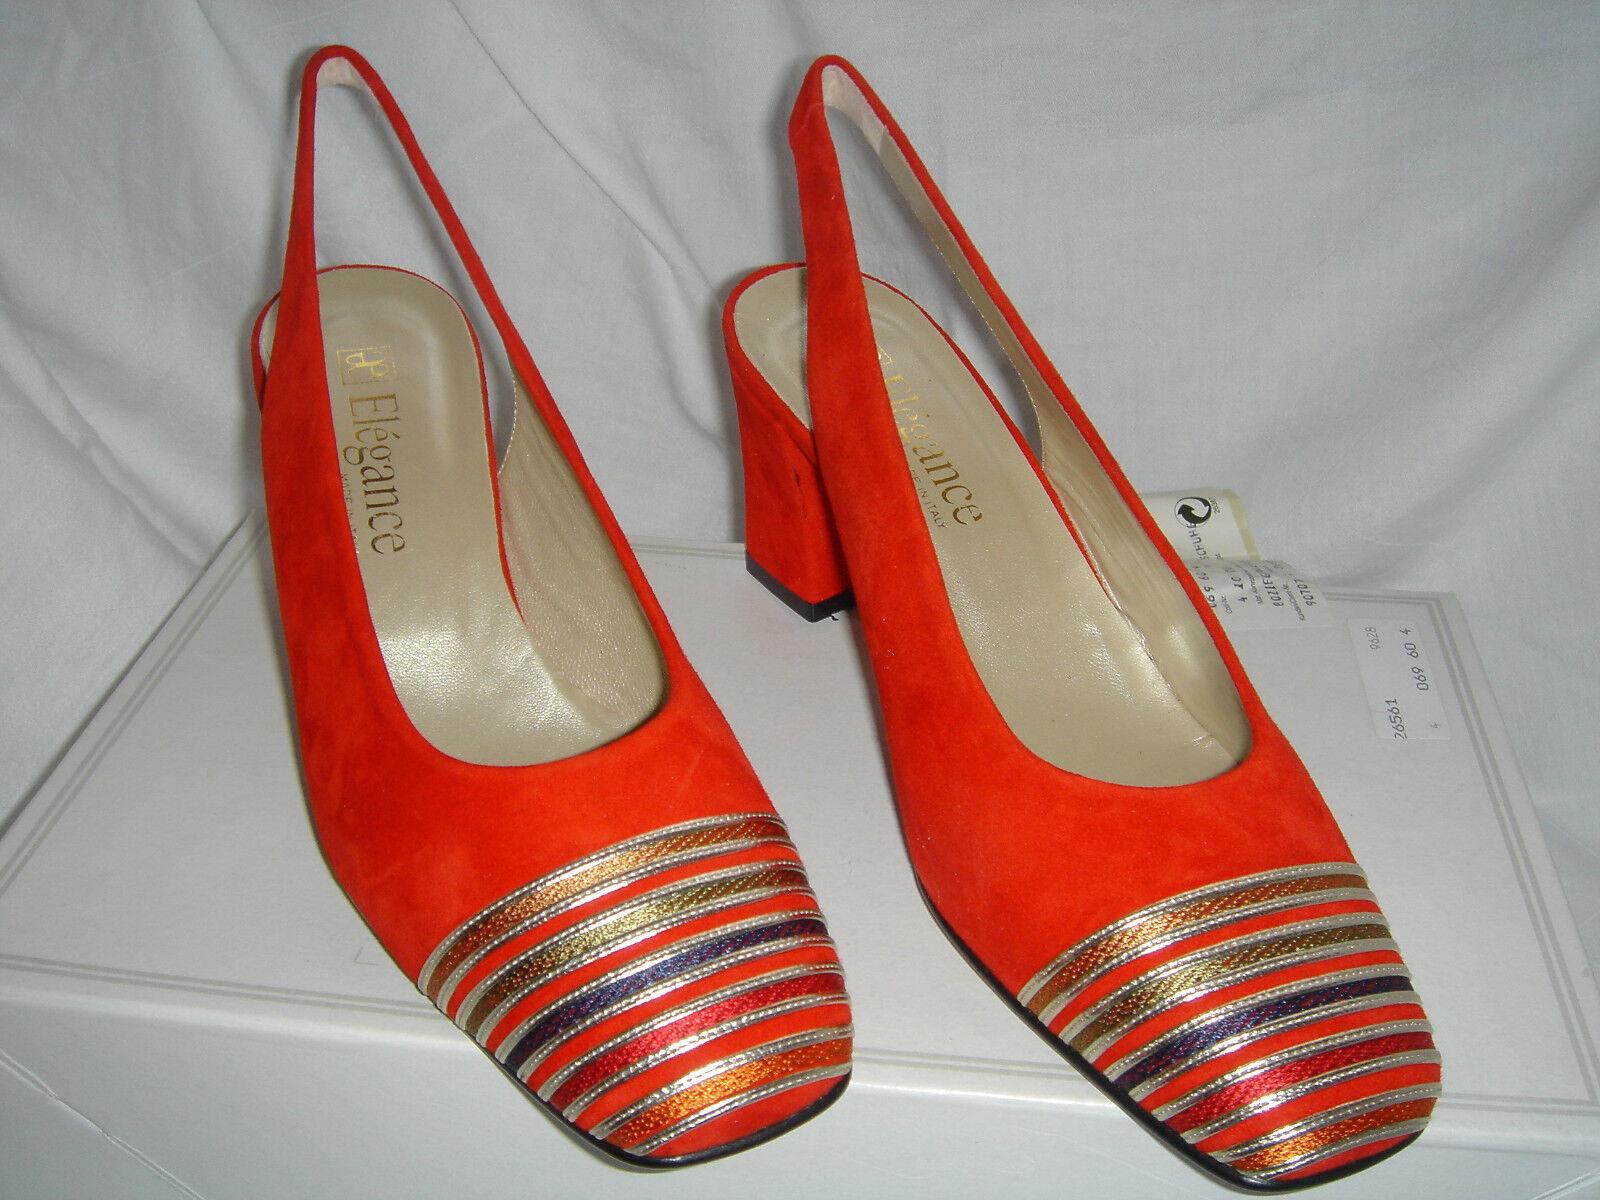 Damenschuh rot Größe 37 ae Elegance